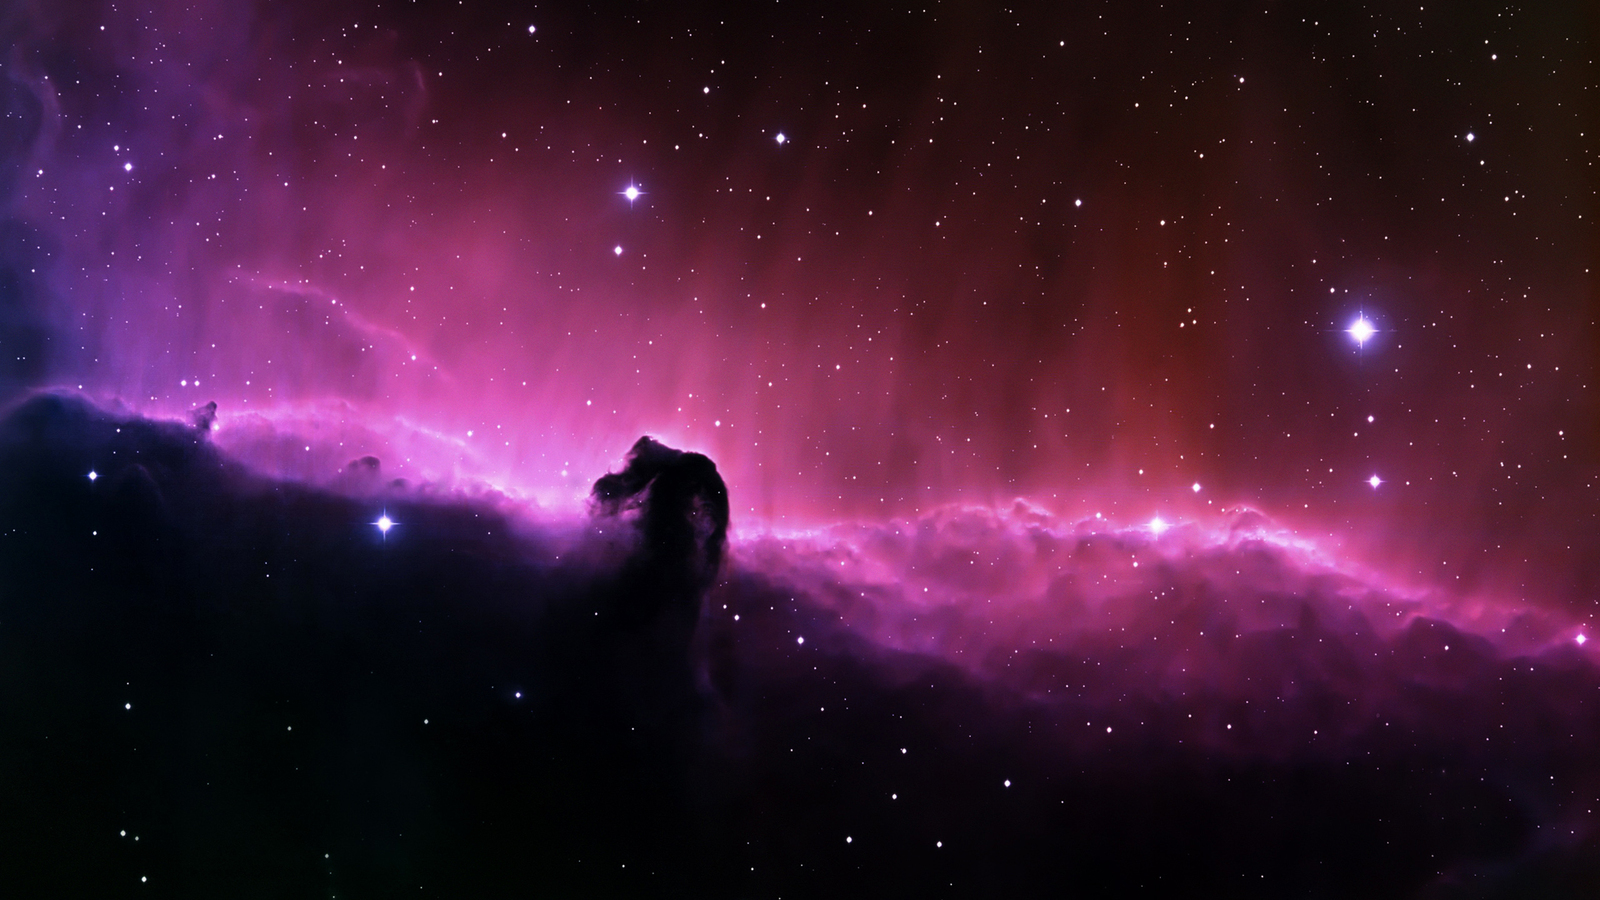 Most Inspiring   Wallpaper Horse Chromebook - freida-pinto-space-n-hd-horse-head-nebula-jpeg-1121842  2018_92773.jpg